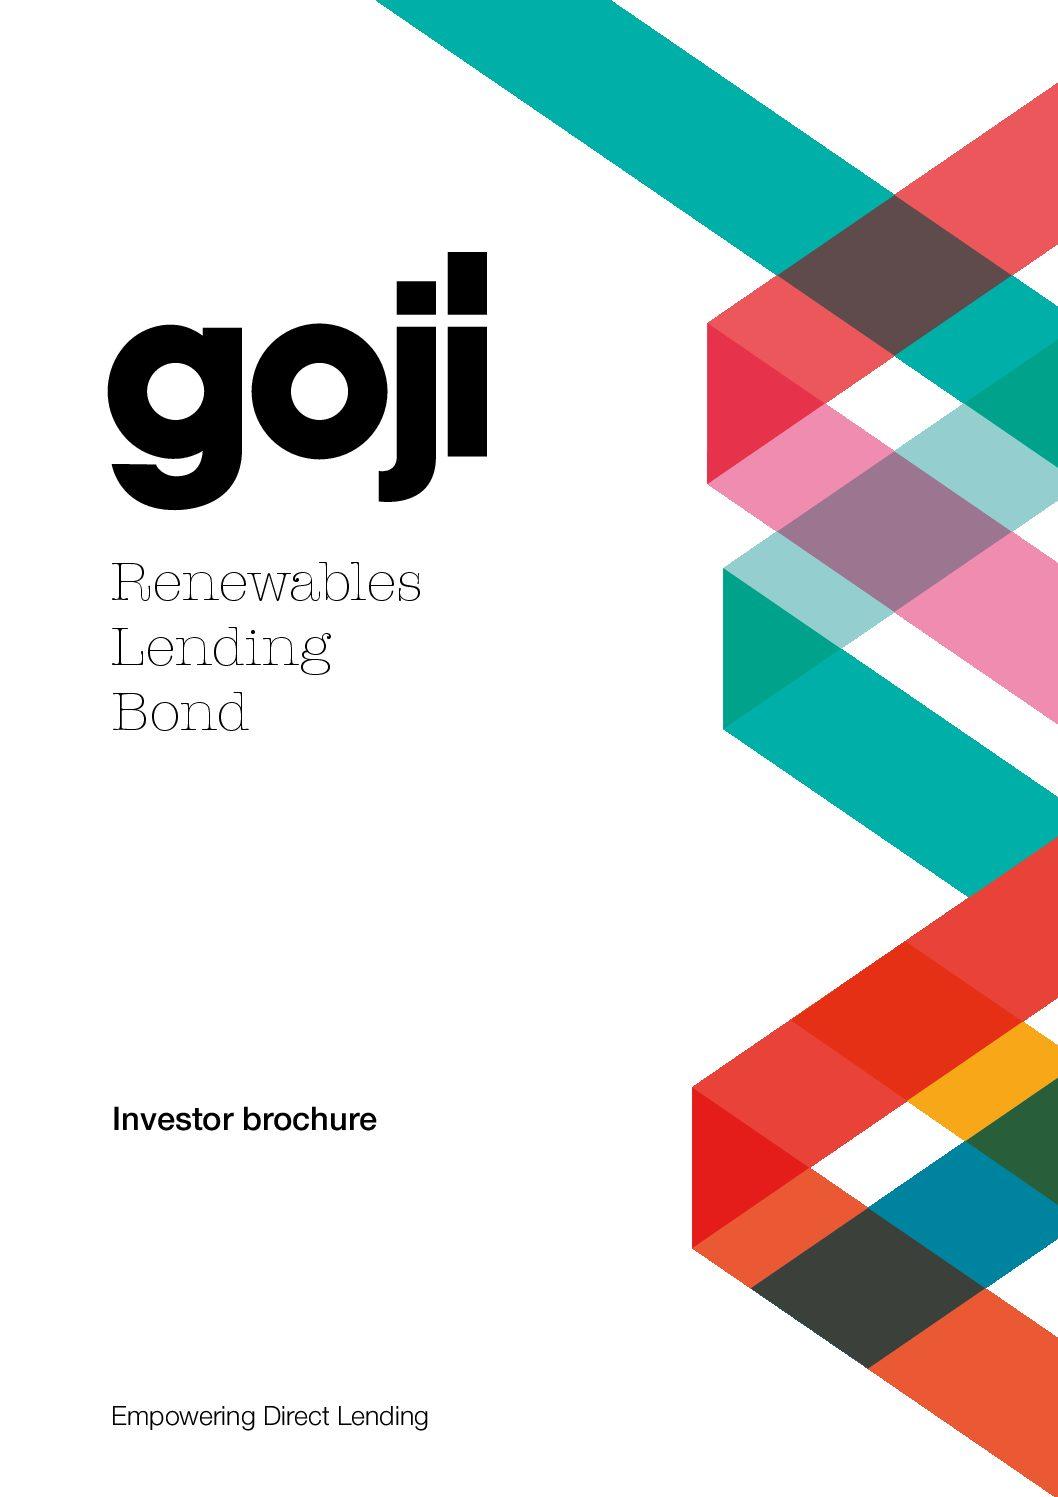 Renewables Lending Bond Direct Investor brochure-Goji Direct Lending Investment Experts